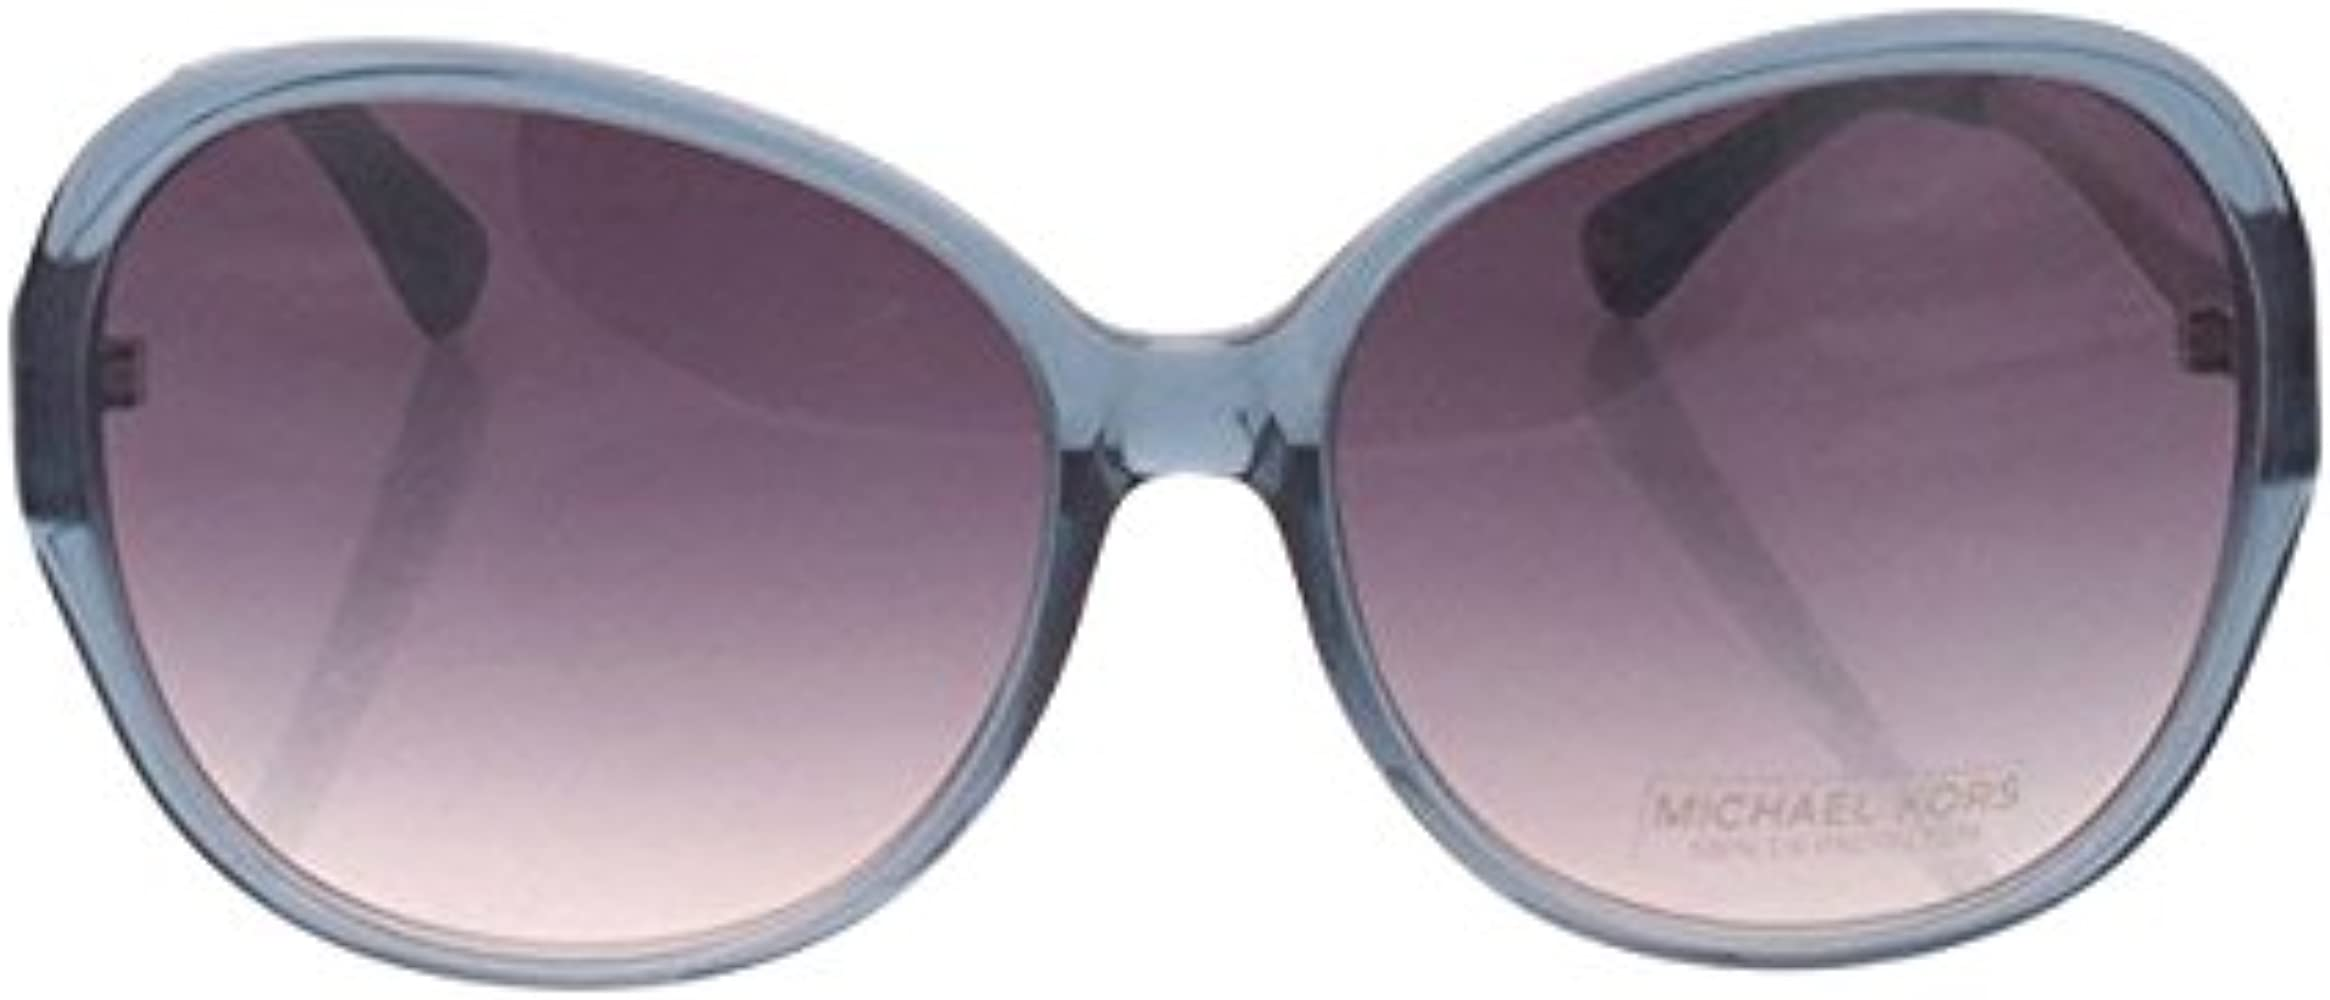 Michael Kors Gafas de Sol MK-M2453S-424-DRAKE Azul/Negro ...